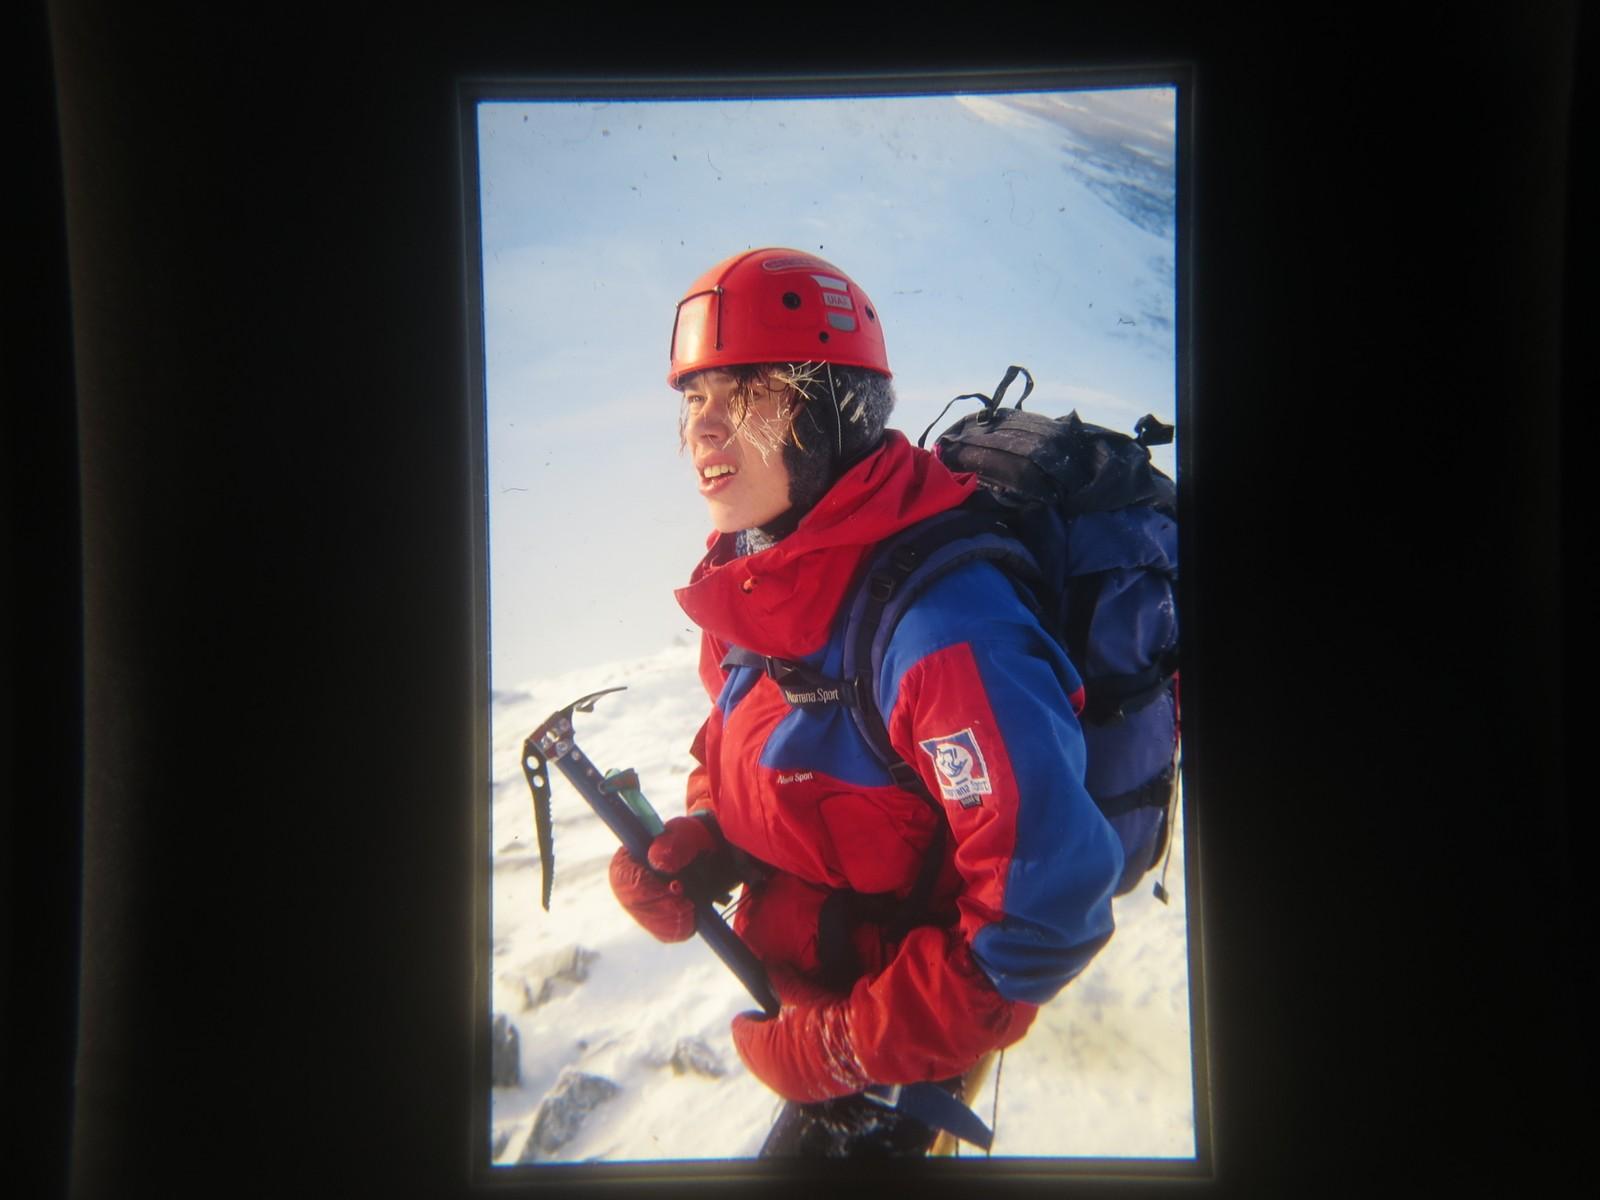 Mikal Nerberg på klatretur med Marius Martenson i 1997.